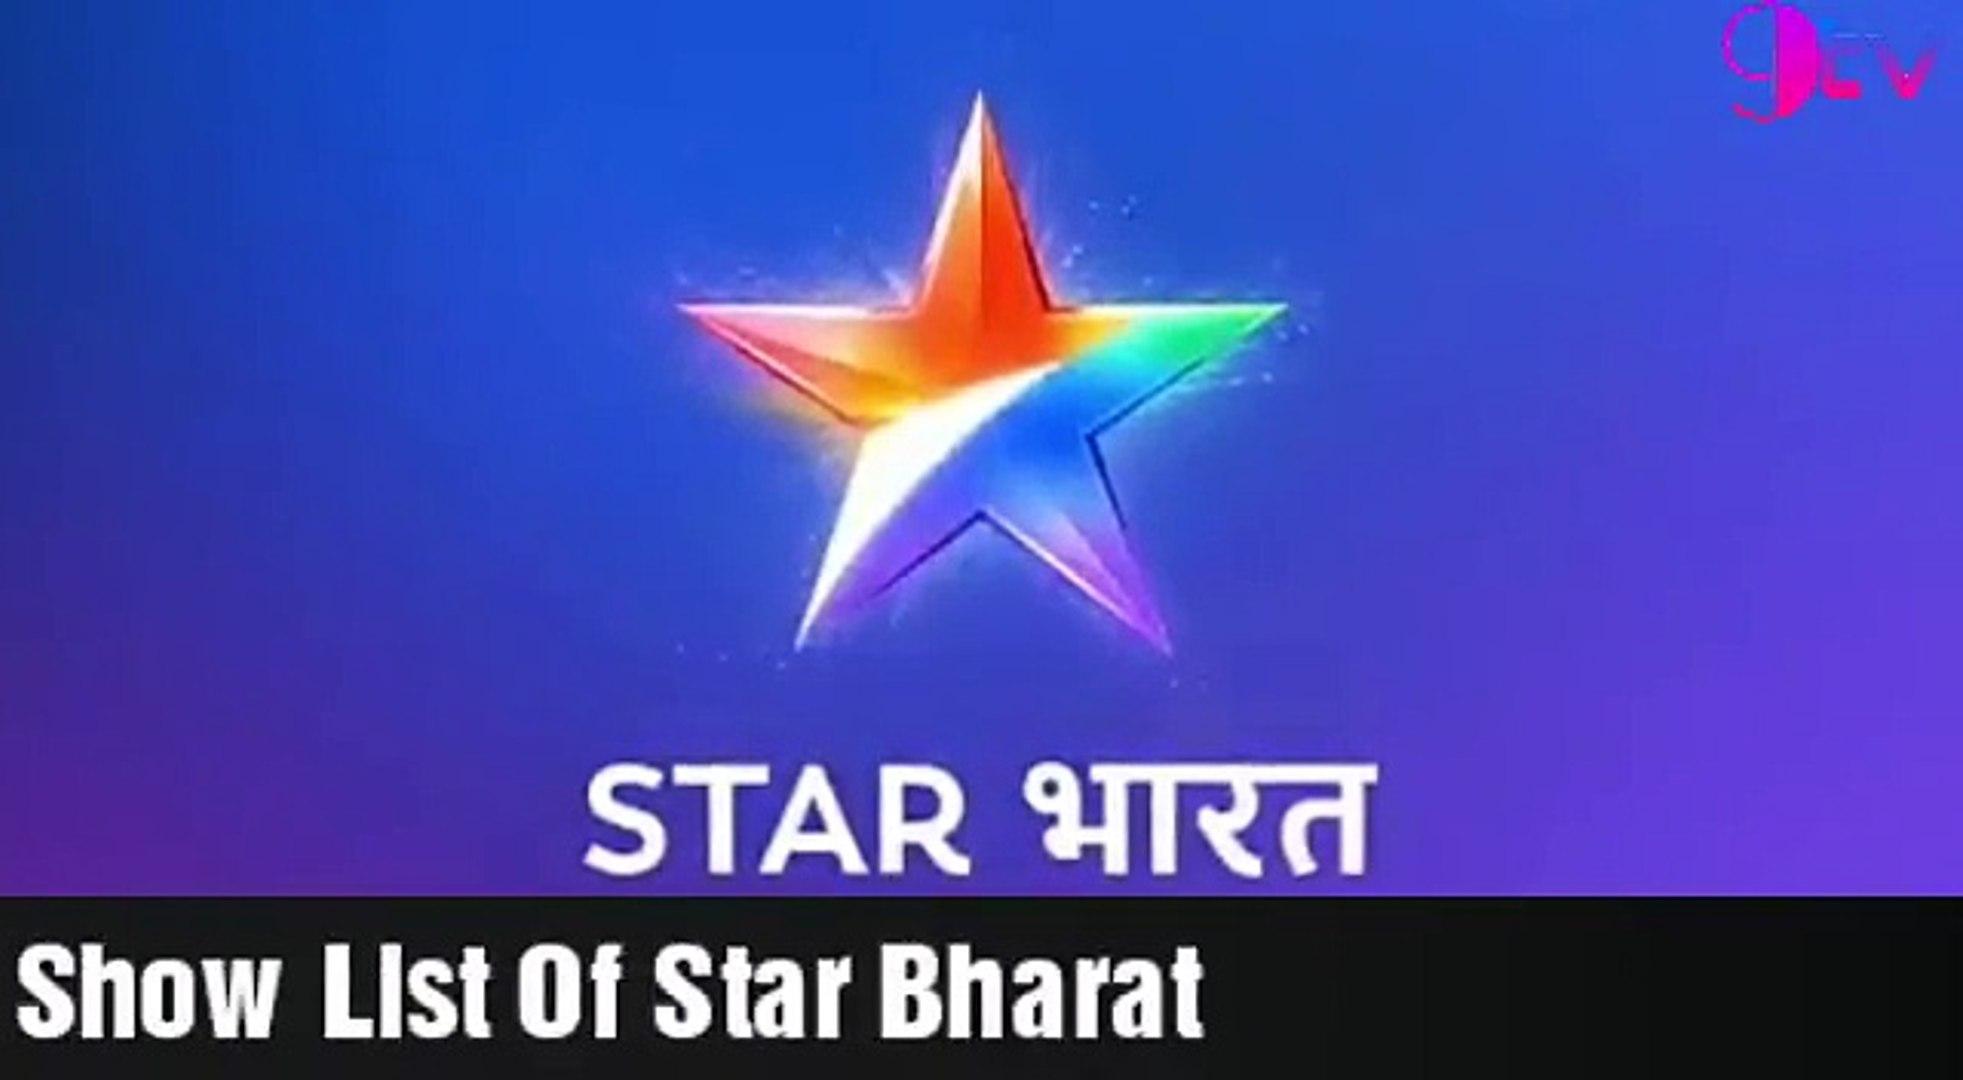 Star Bharat All Tv Show Live